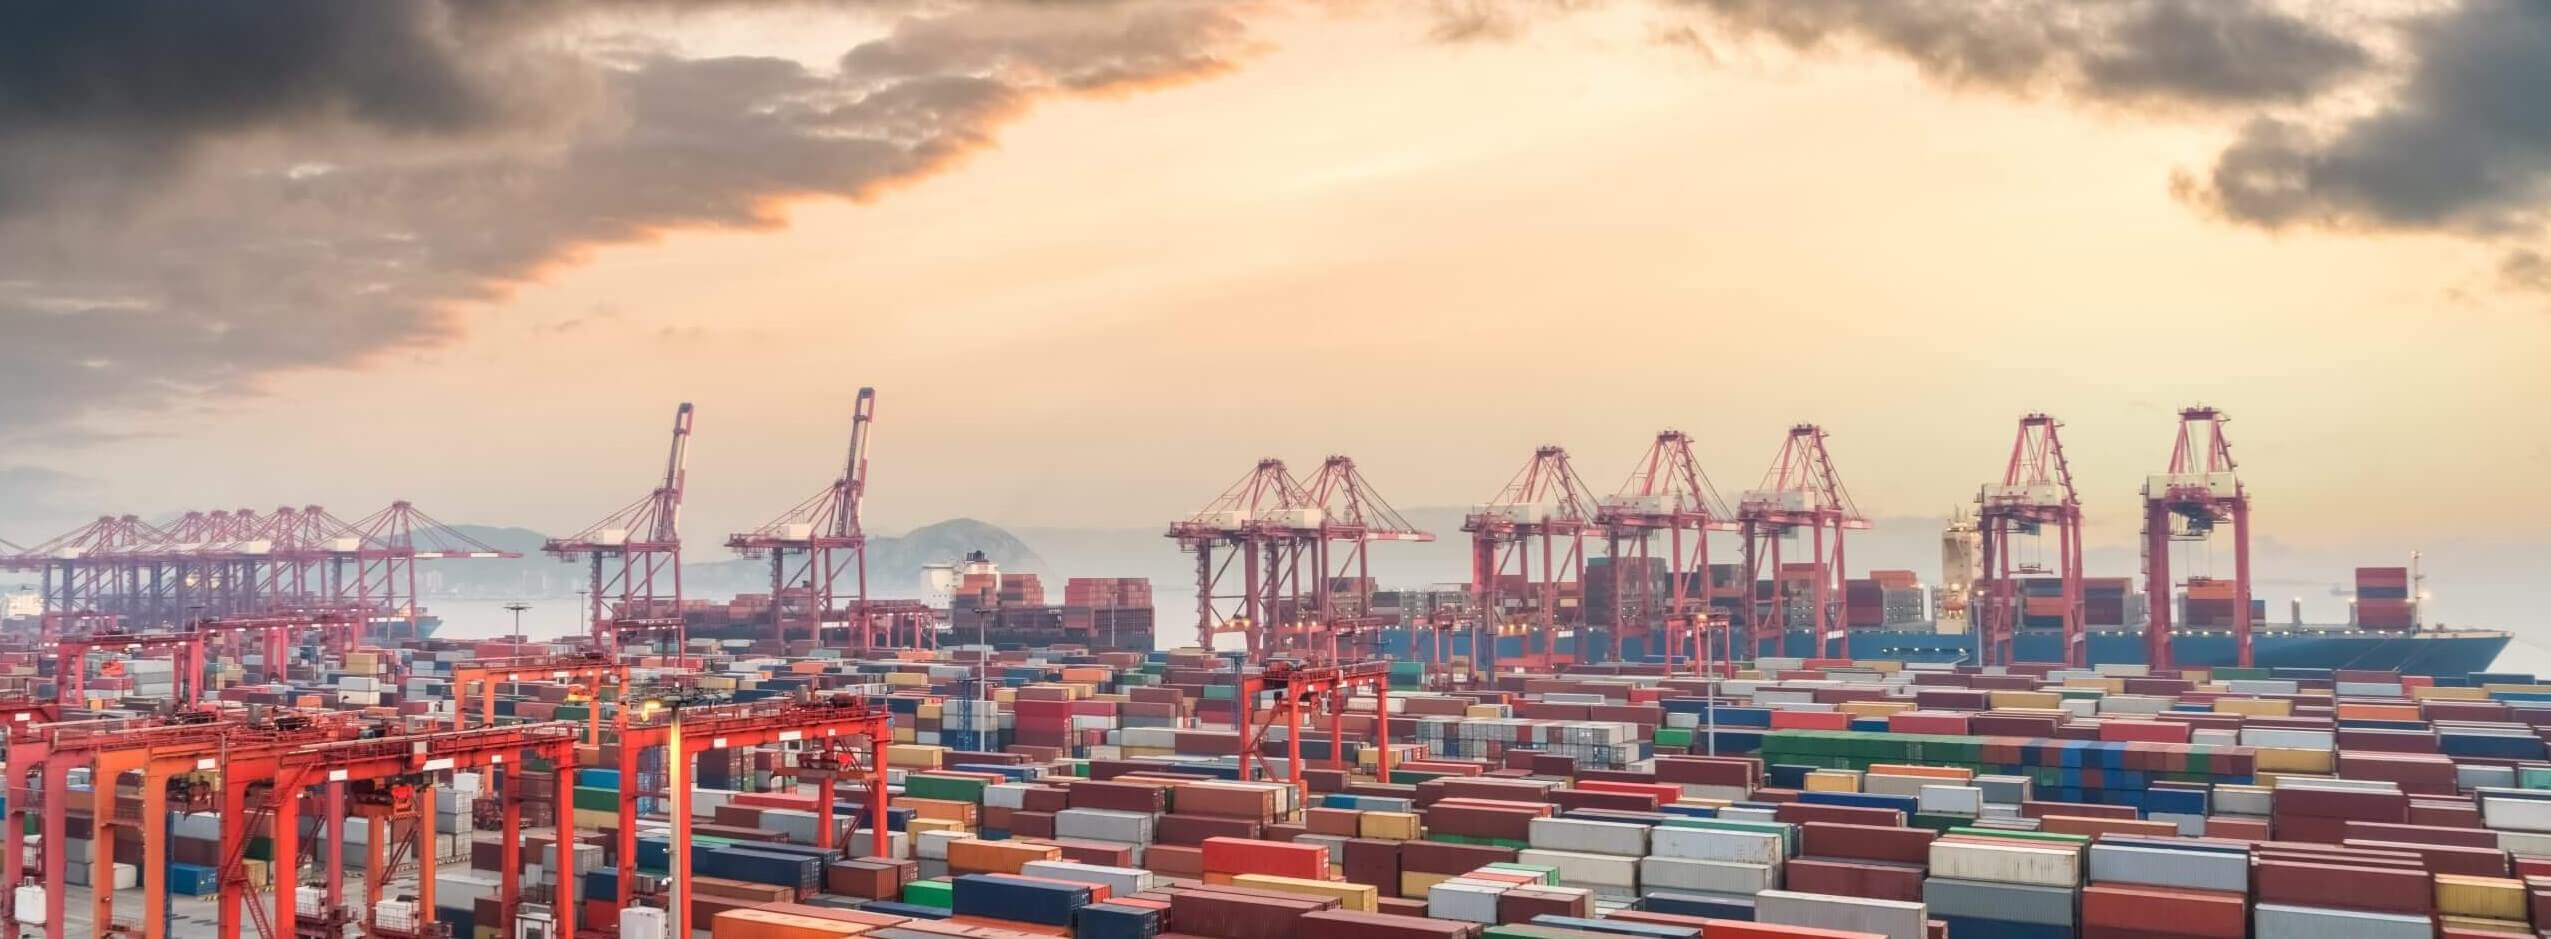 IBM Supply Chain, IBM, Supply Chain, Pragmaedge,